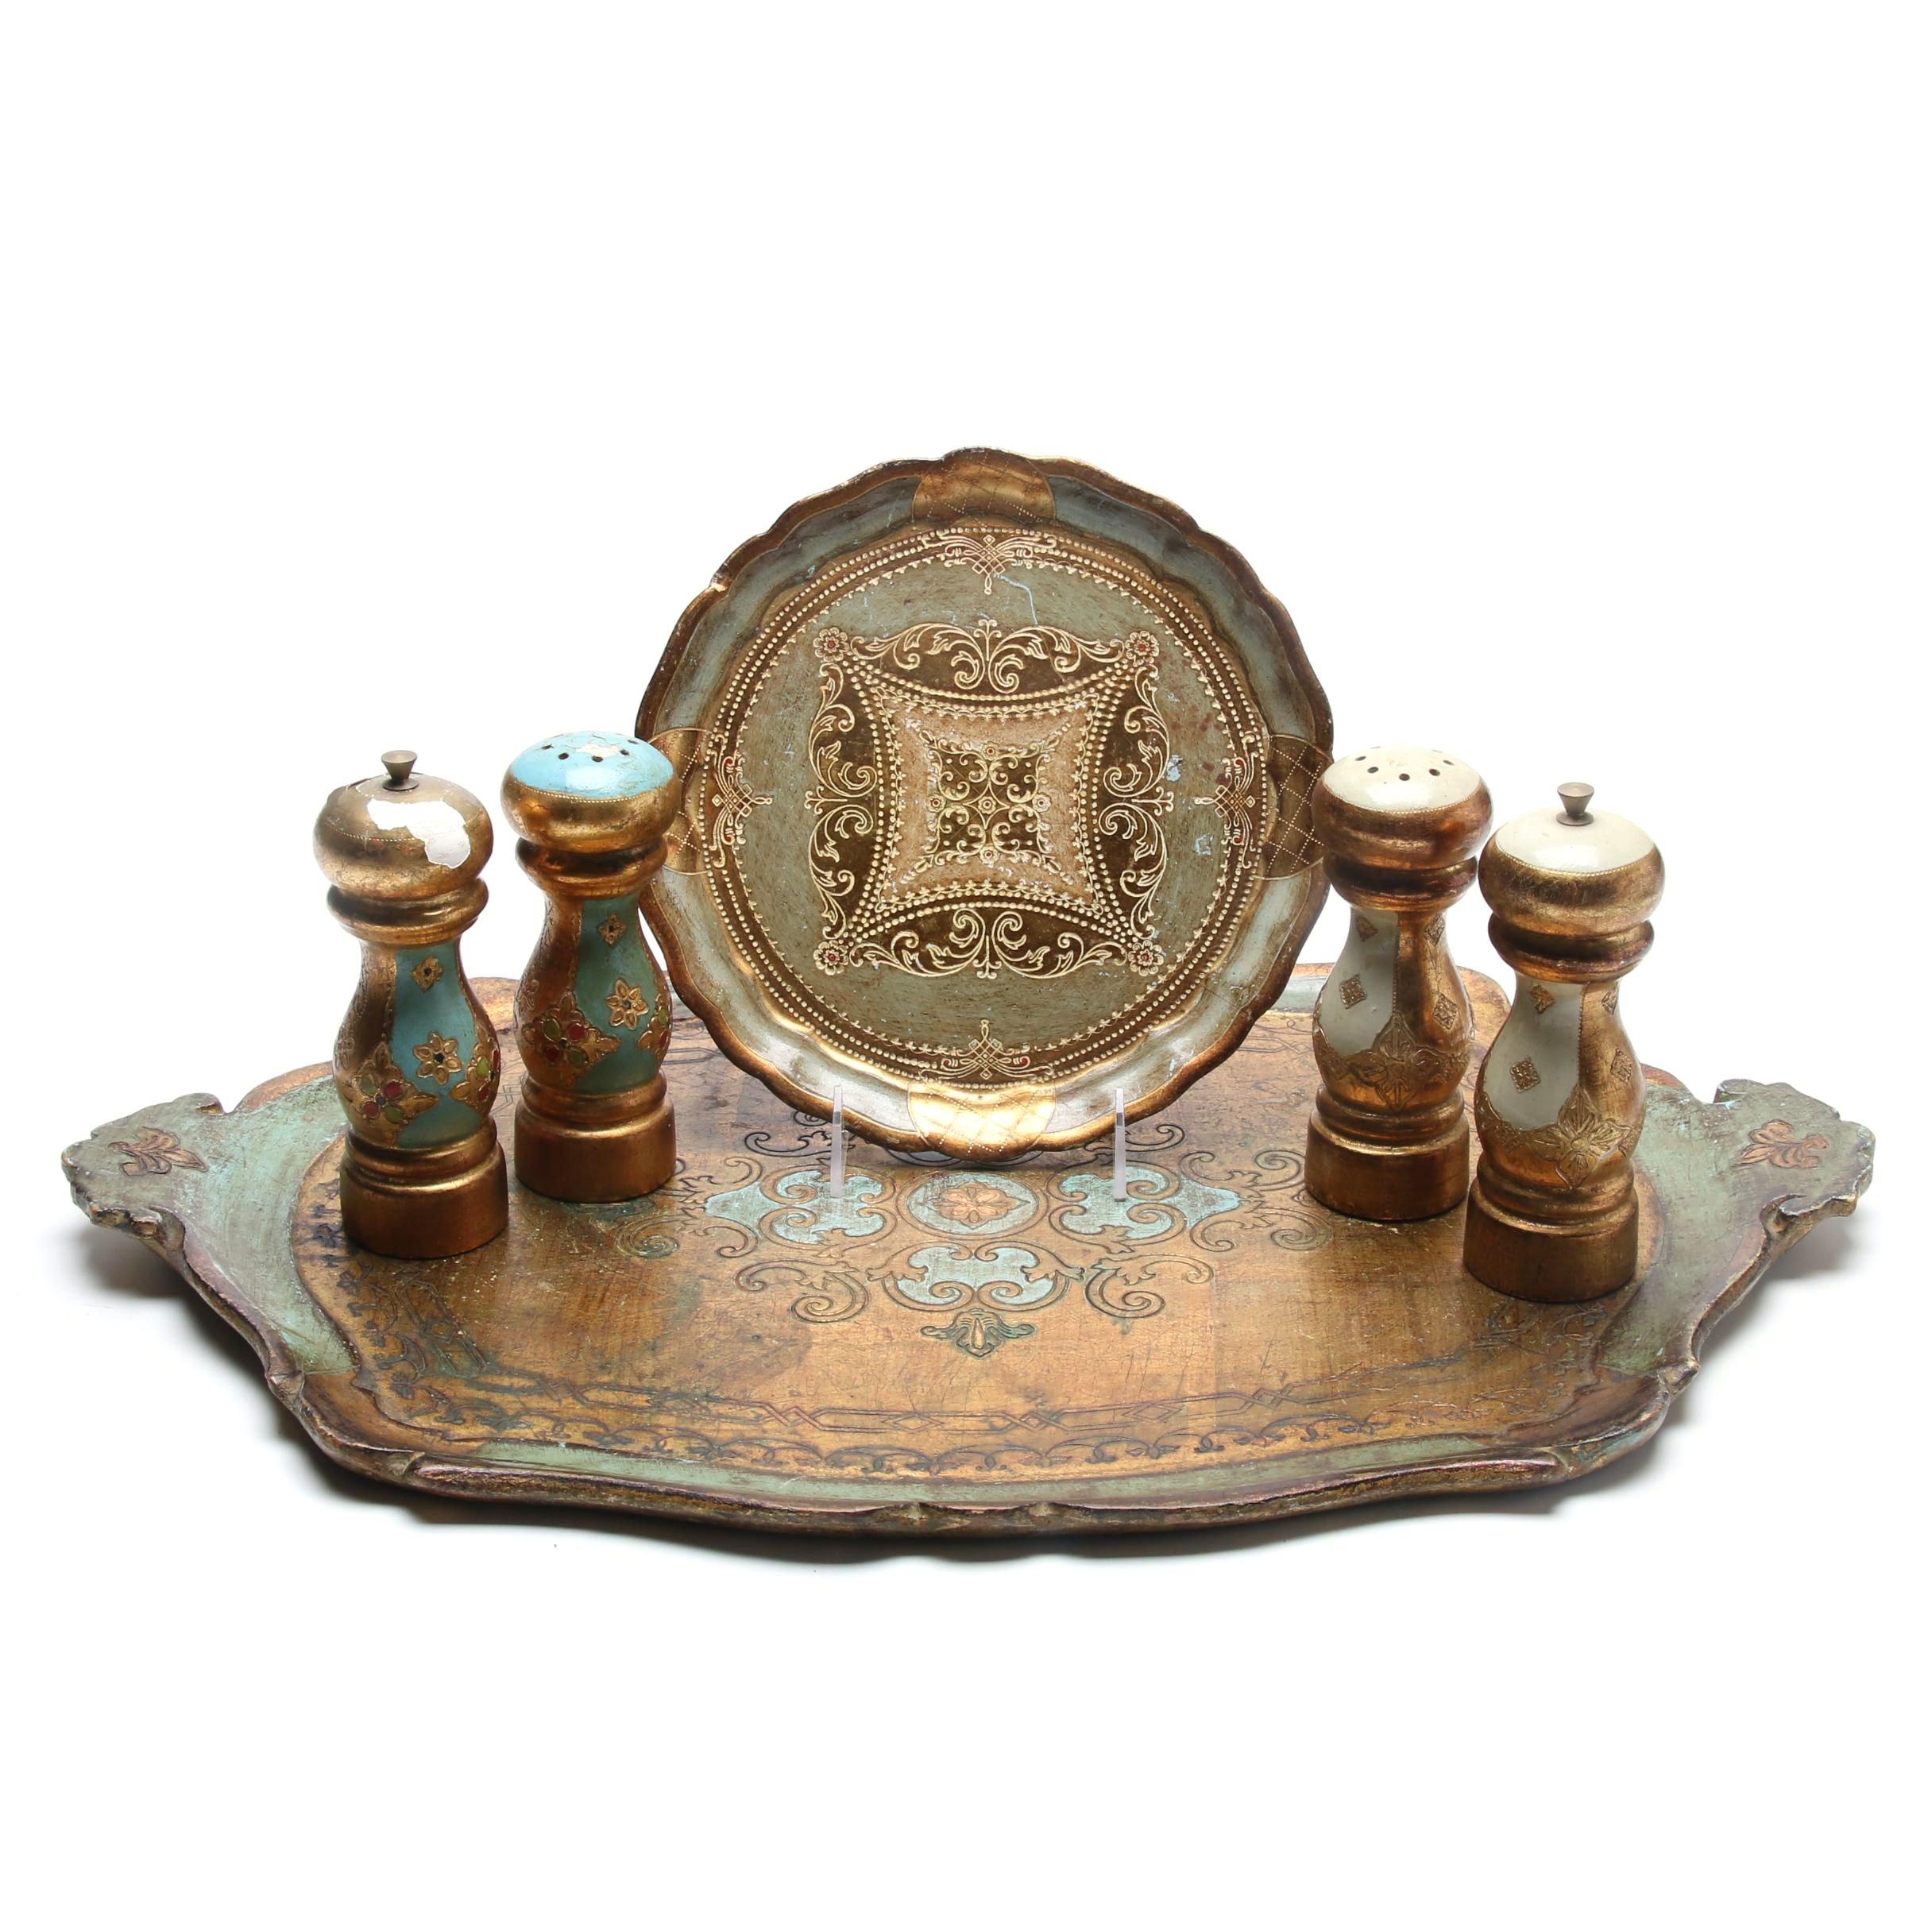 Handmade Italian Wooden and Gold Leaf Tableware